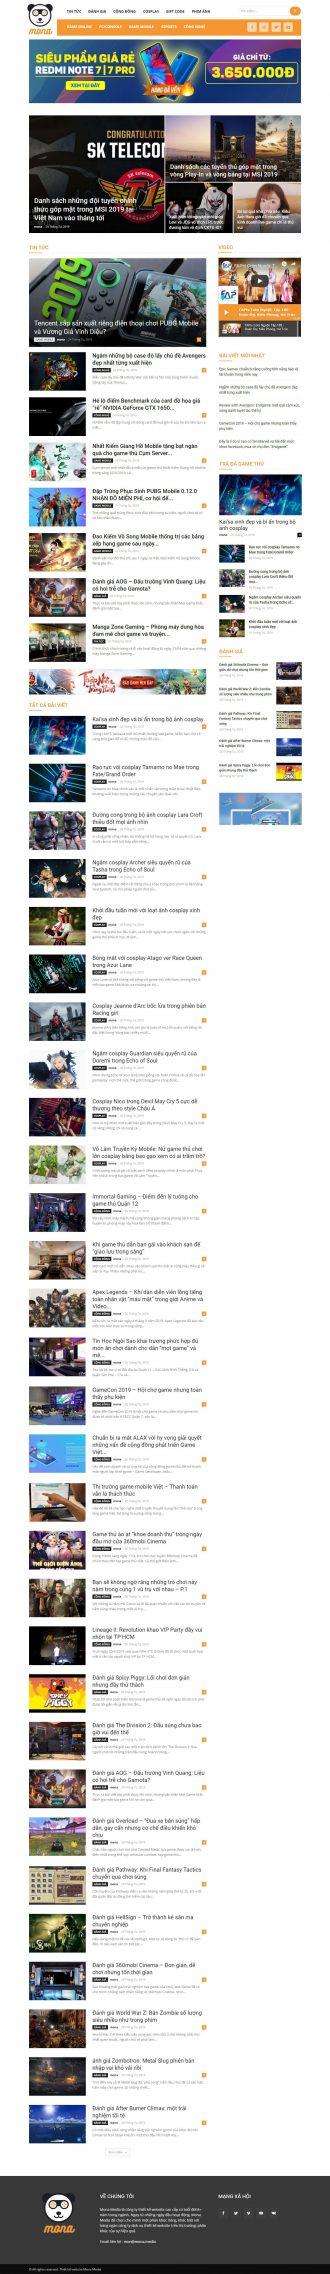 Mẫu website tin tức Motgame